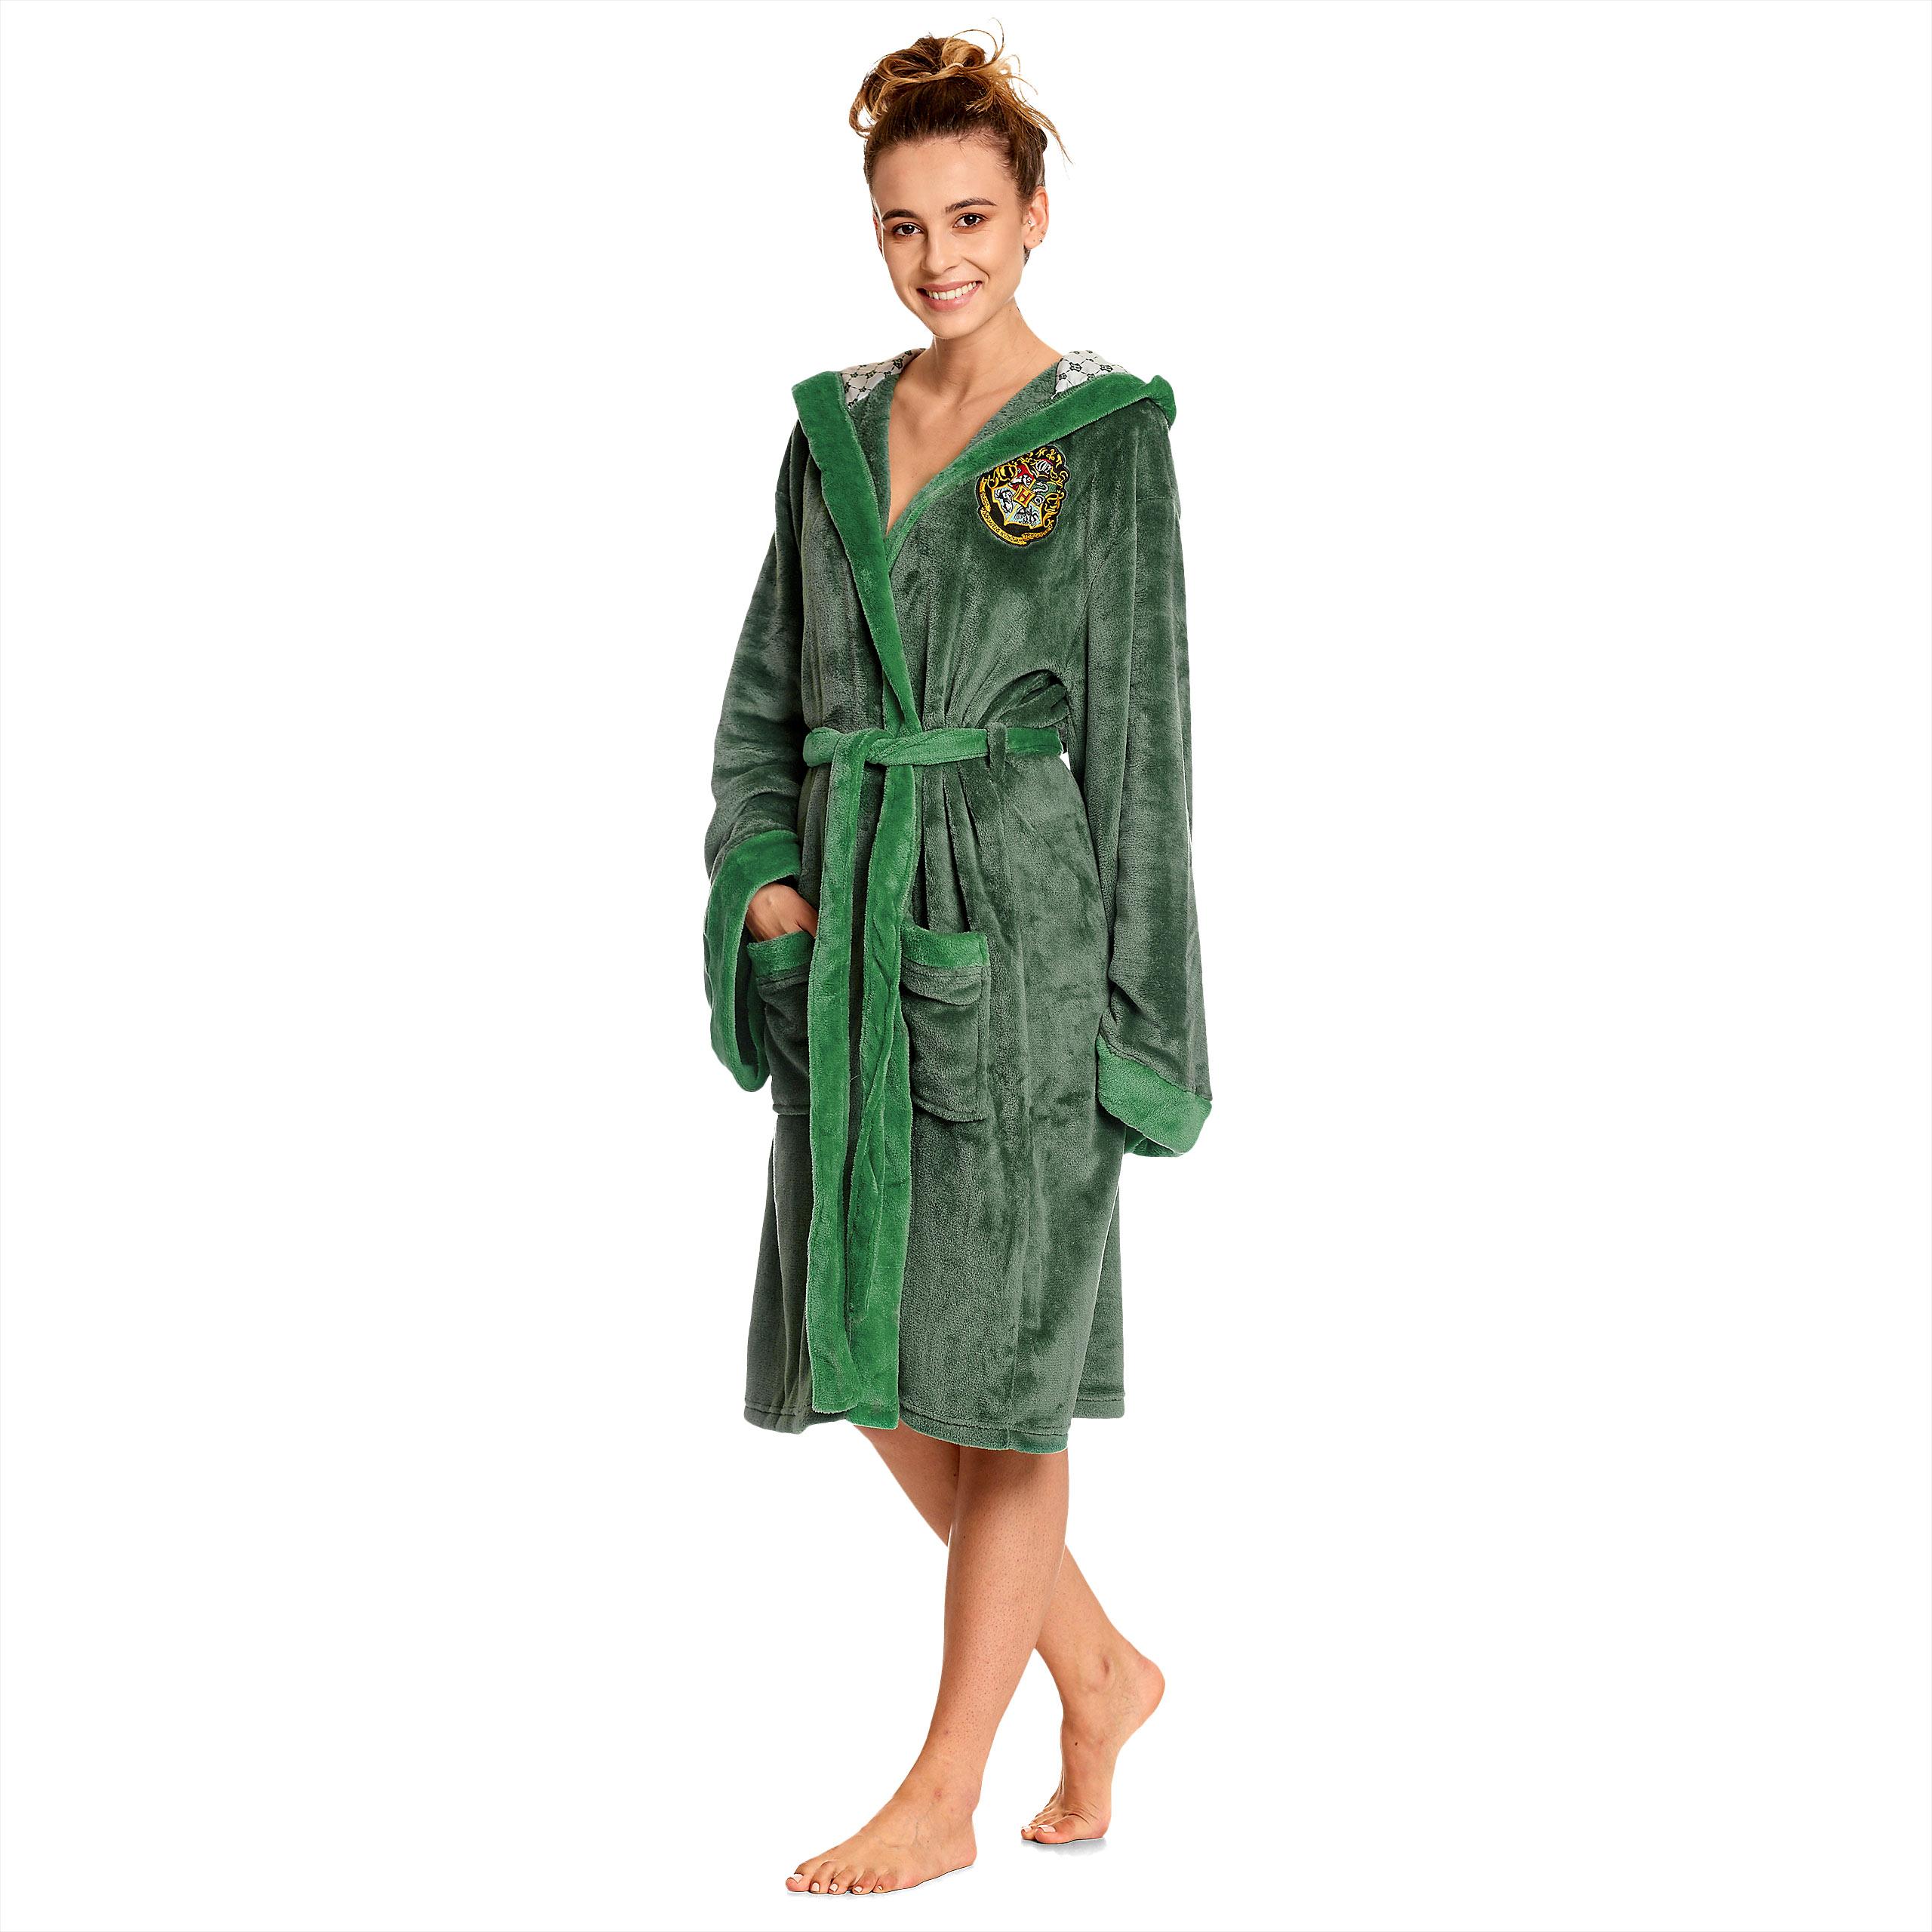 Harry Potter - Slytherin Wappen Bademantel grün